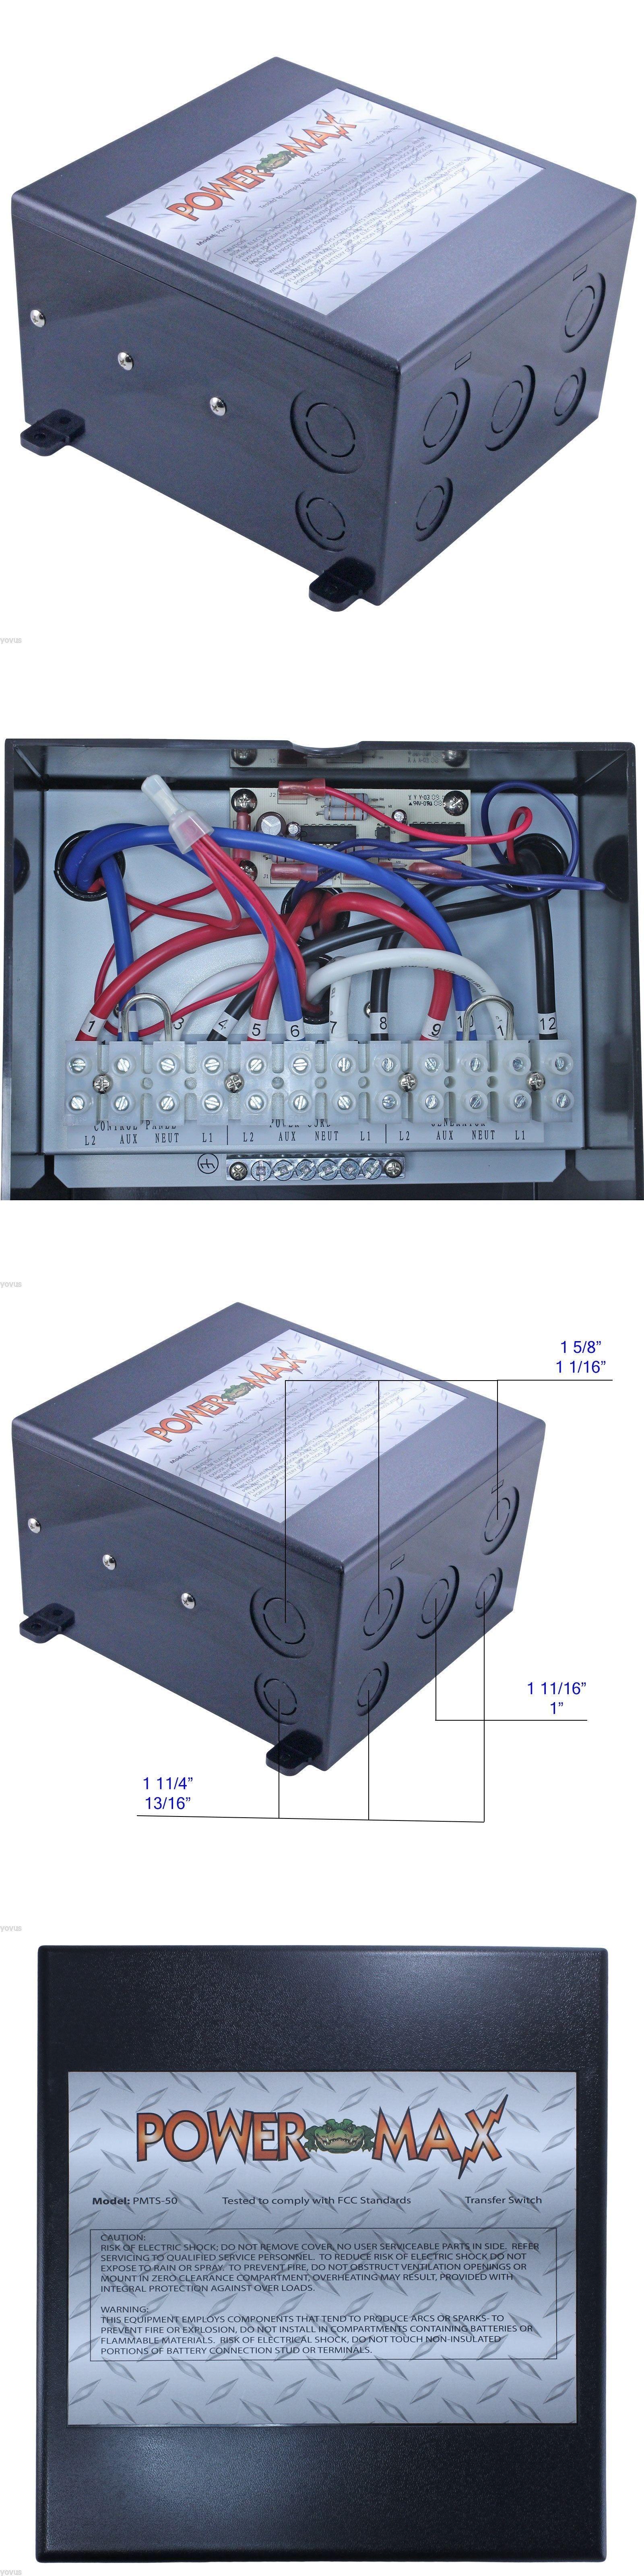 circuit breakers and fuse boxes 20596 powermax pmts 50 50 amp 120 240 vac [ 1600 x 6400 Pixel ]